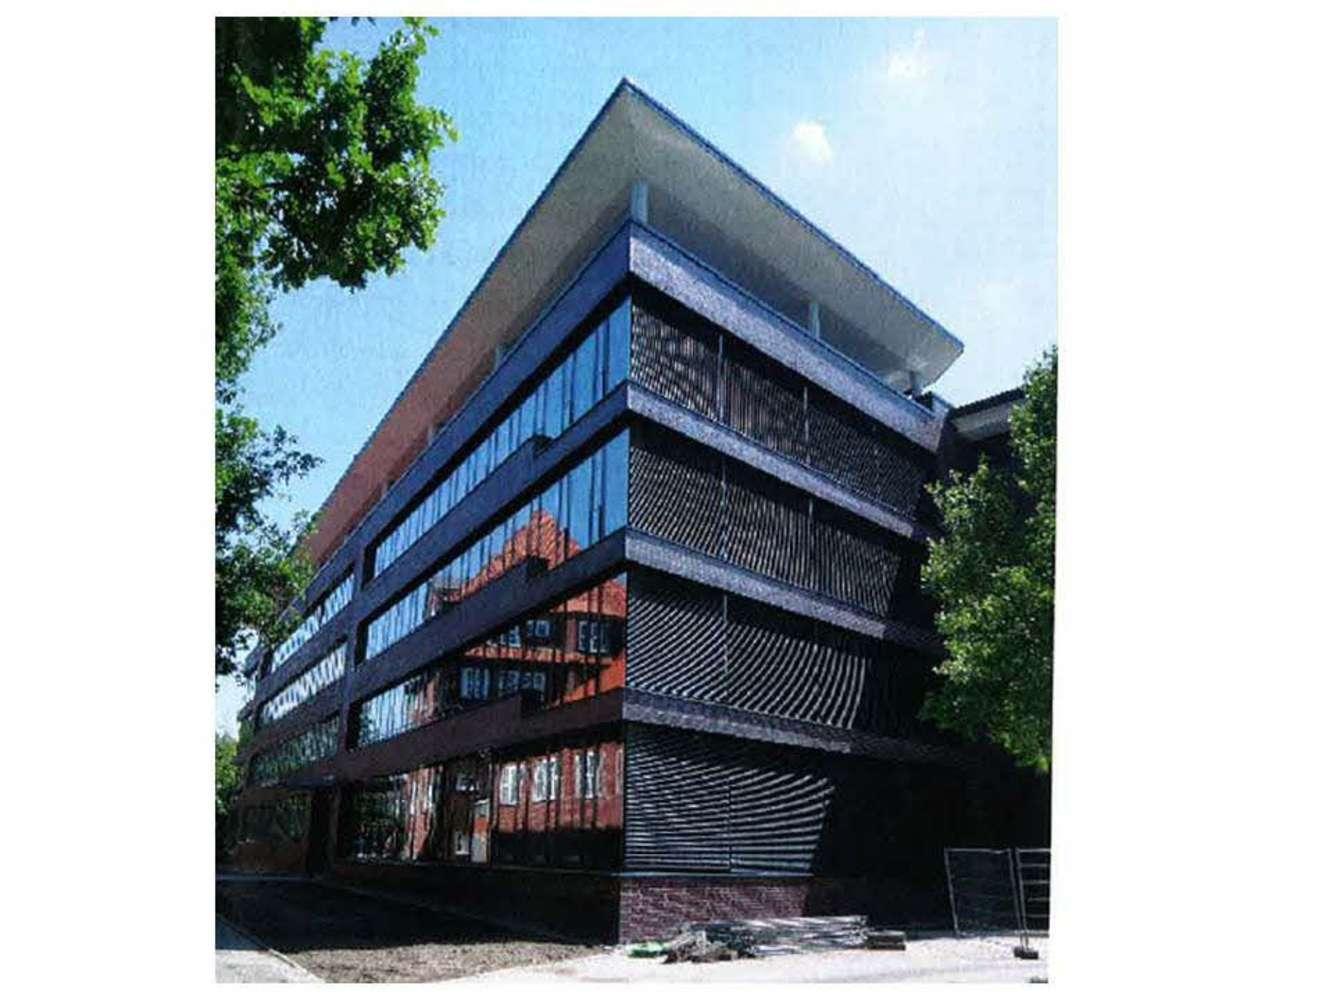 Büros Hamburg, 22083 - Büro - Hamburg, Barmbek-Süd - H0859 - 9997442